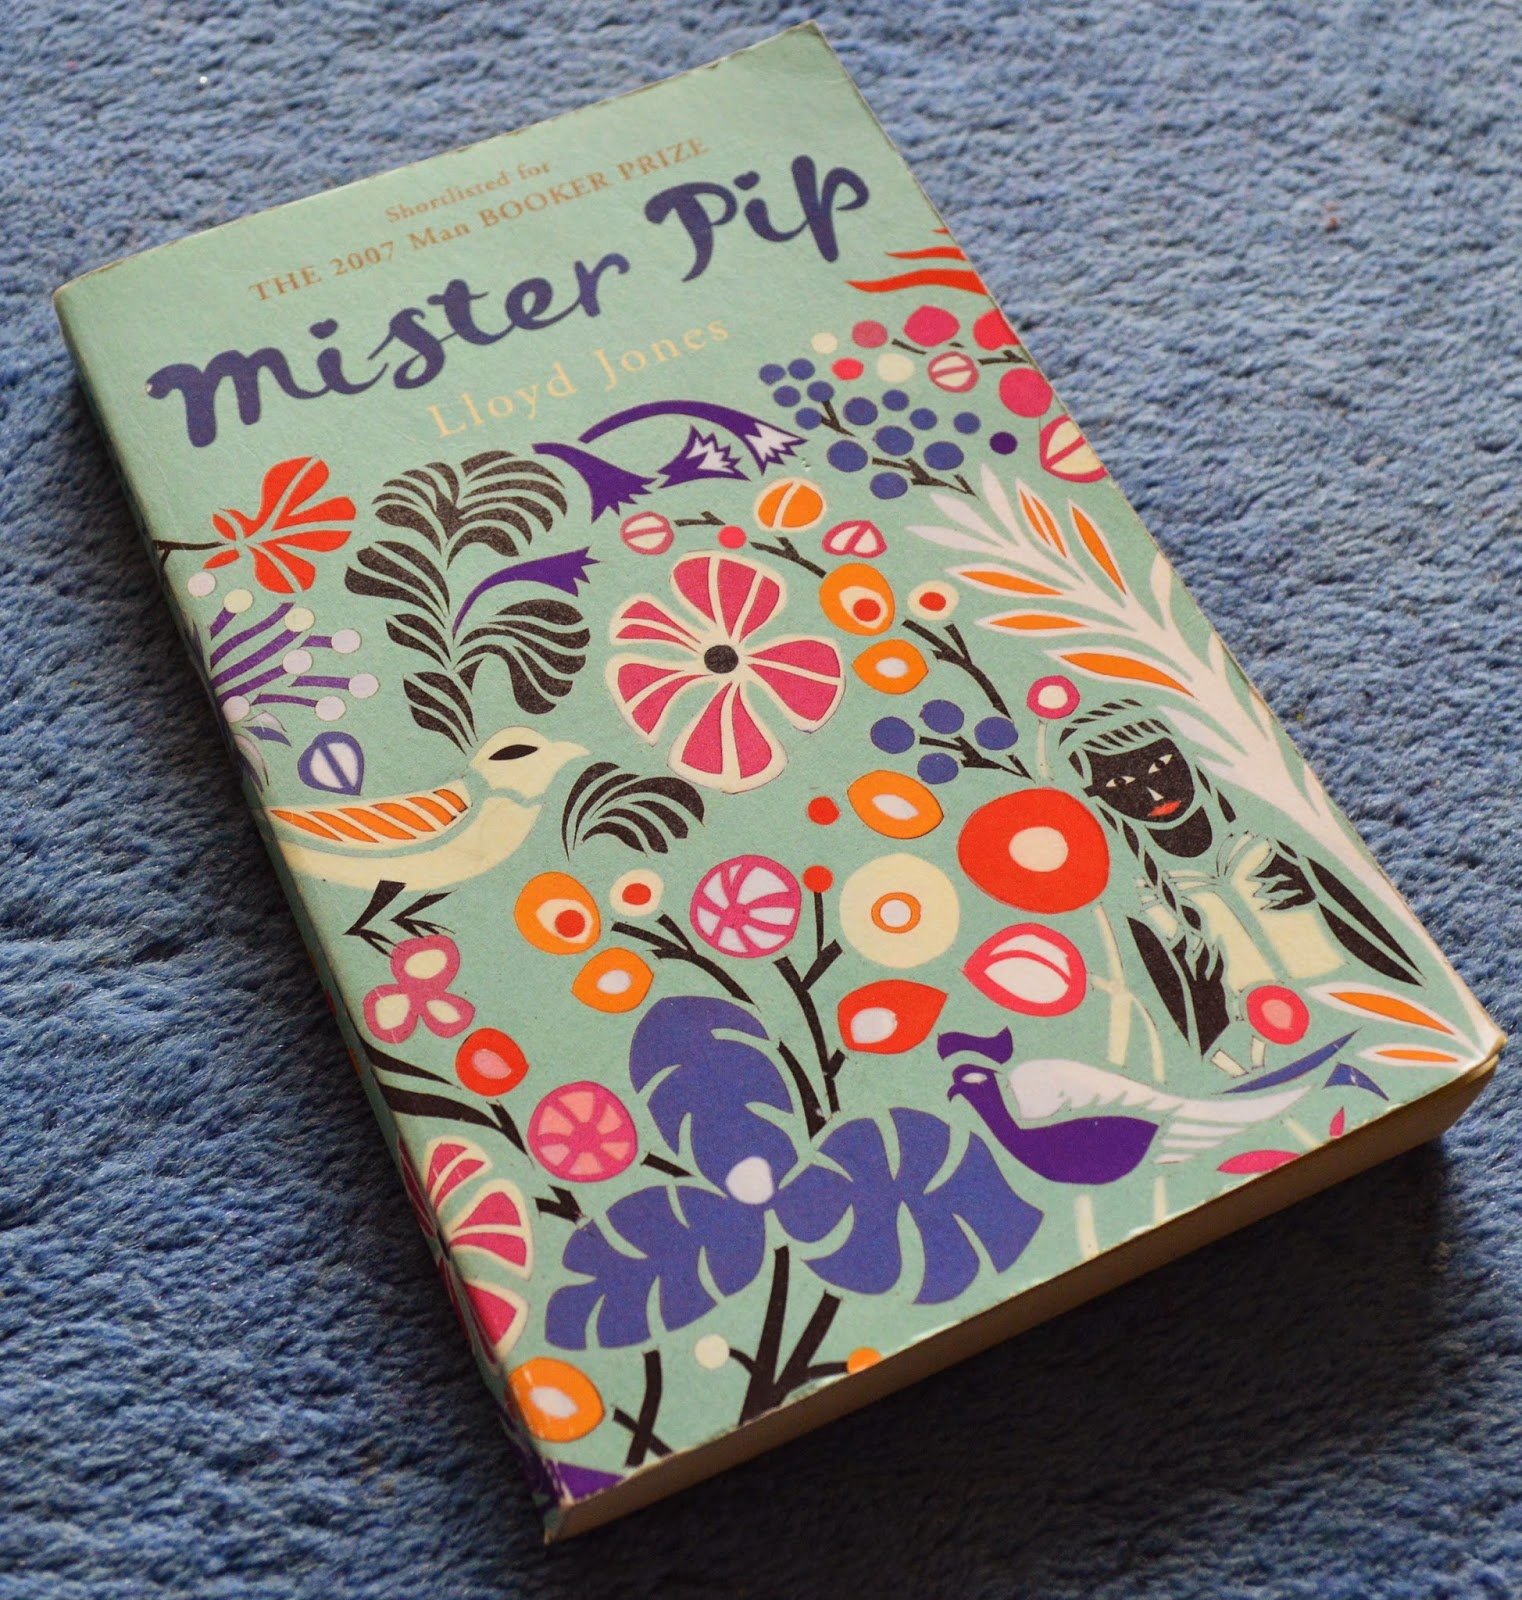 Lloyd Jones, Mister Pip, Bouganville, paperback, book review, fiction